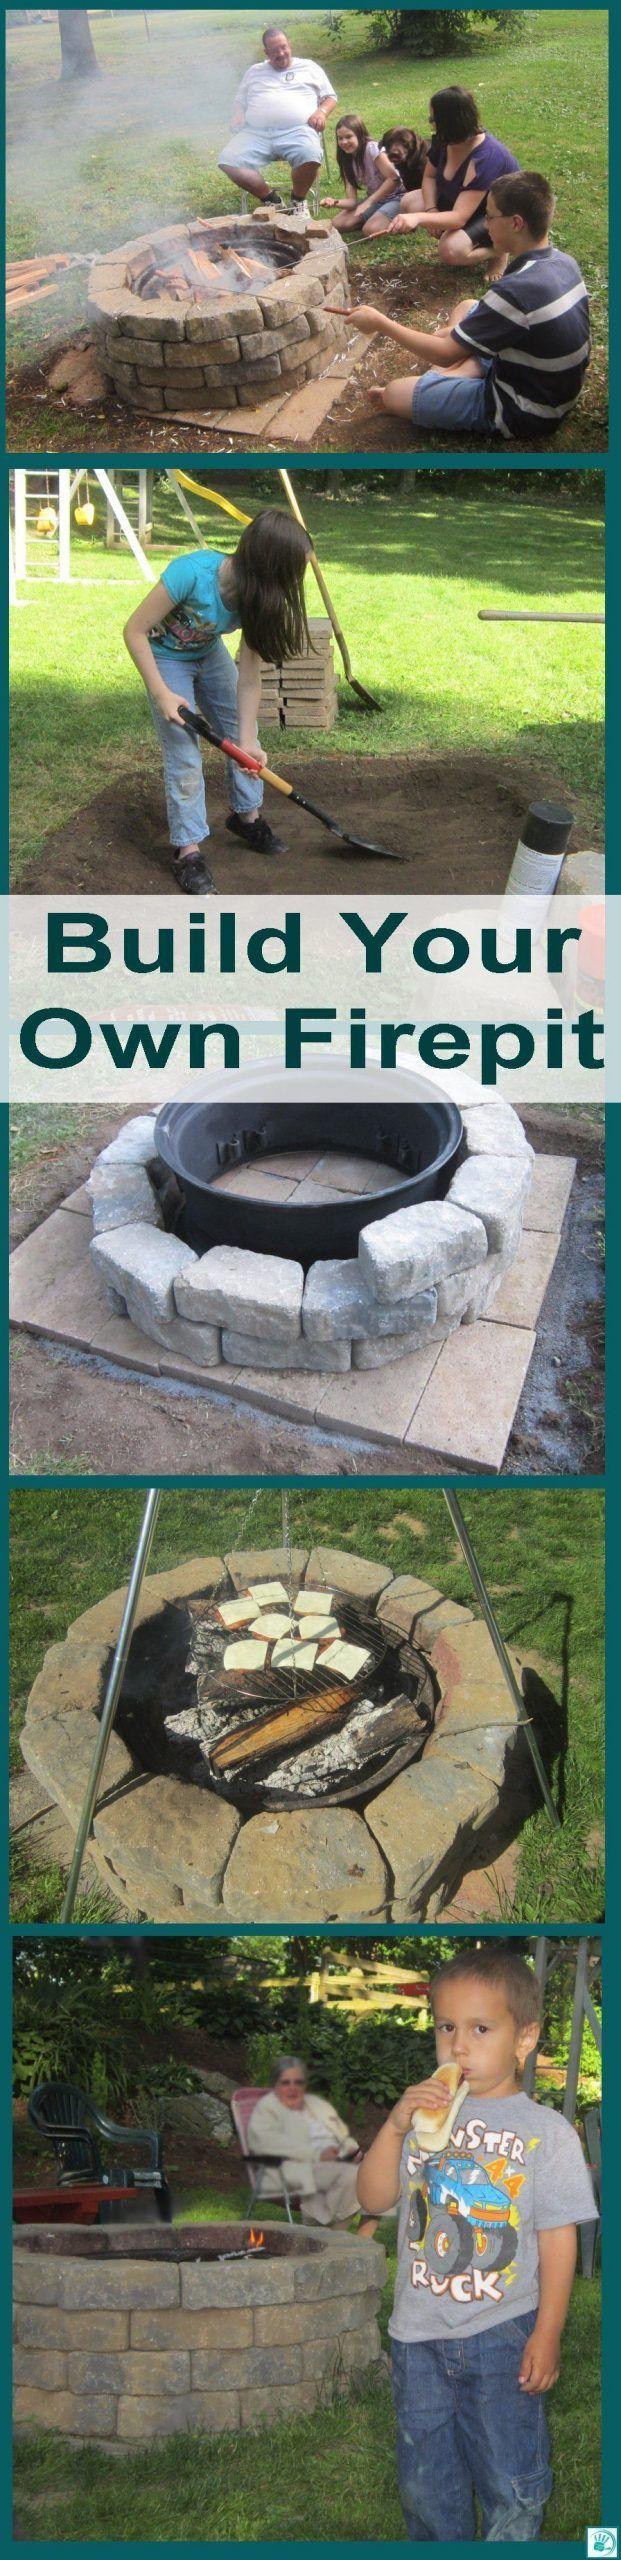 Photo of #FirePit #DIY #BuildYourOwn #Dienstag #DIY #Firepit#buildyouro